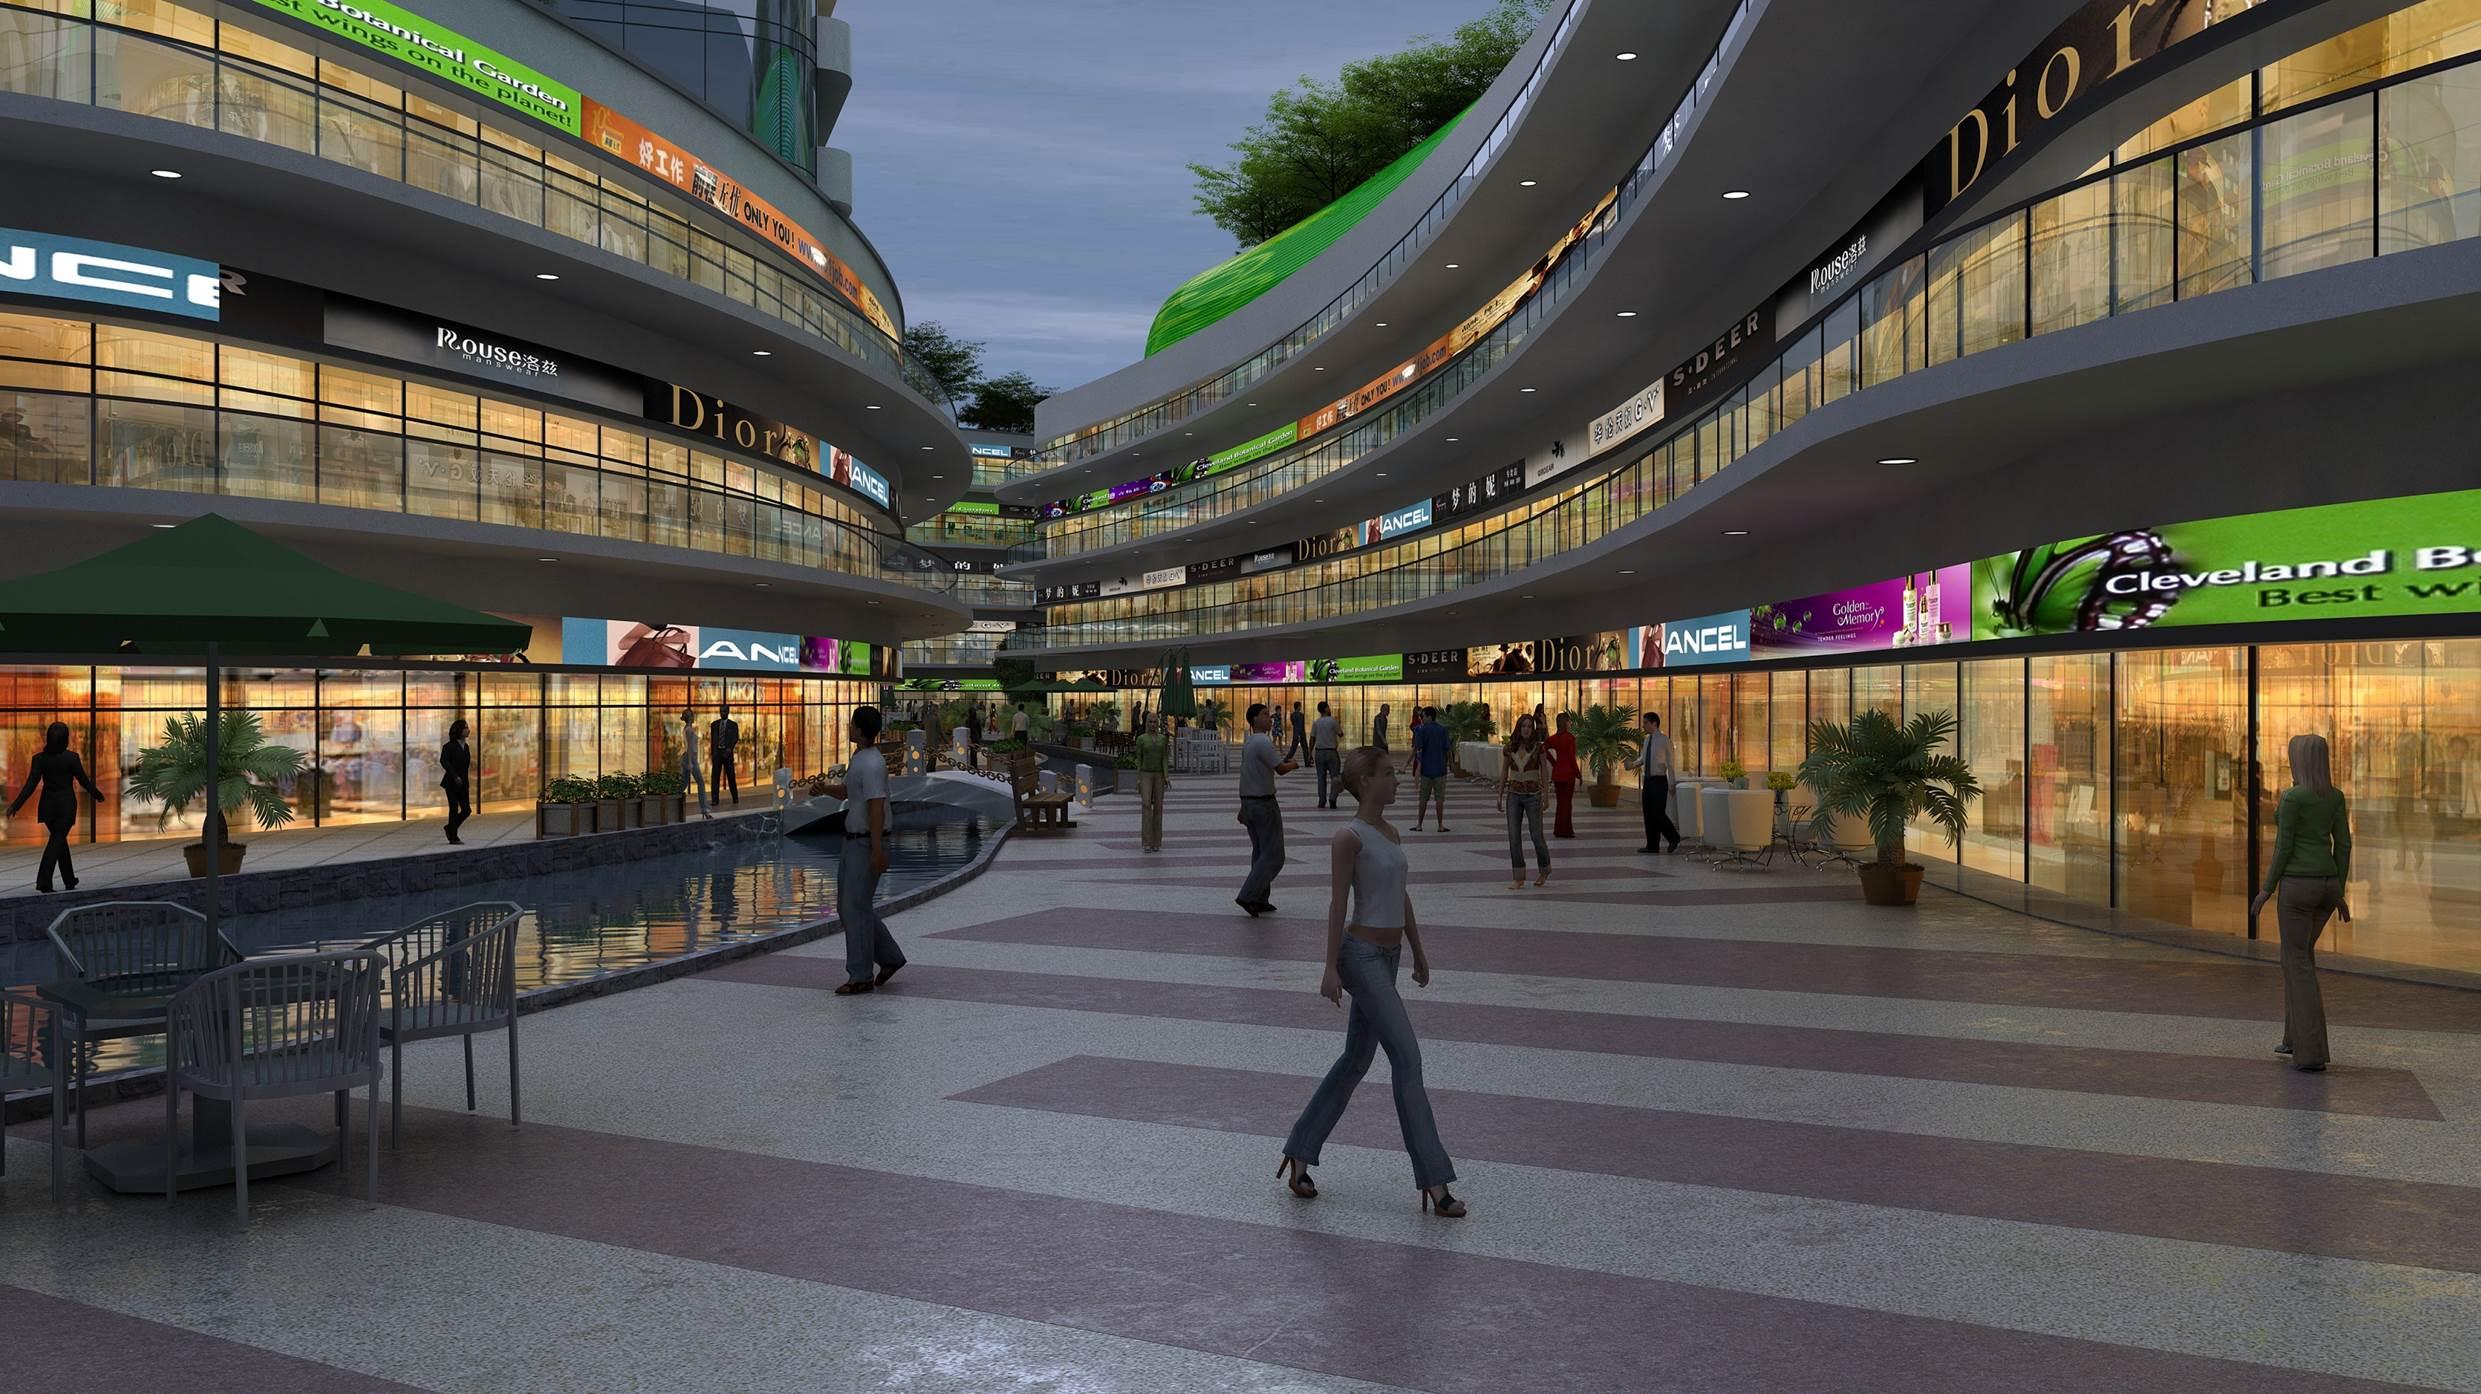 charles_tang_design_commercial_hotel_mixed-use_chengdu_china 4